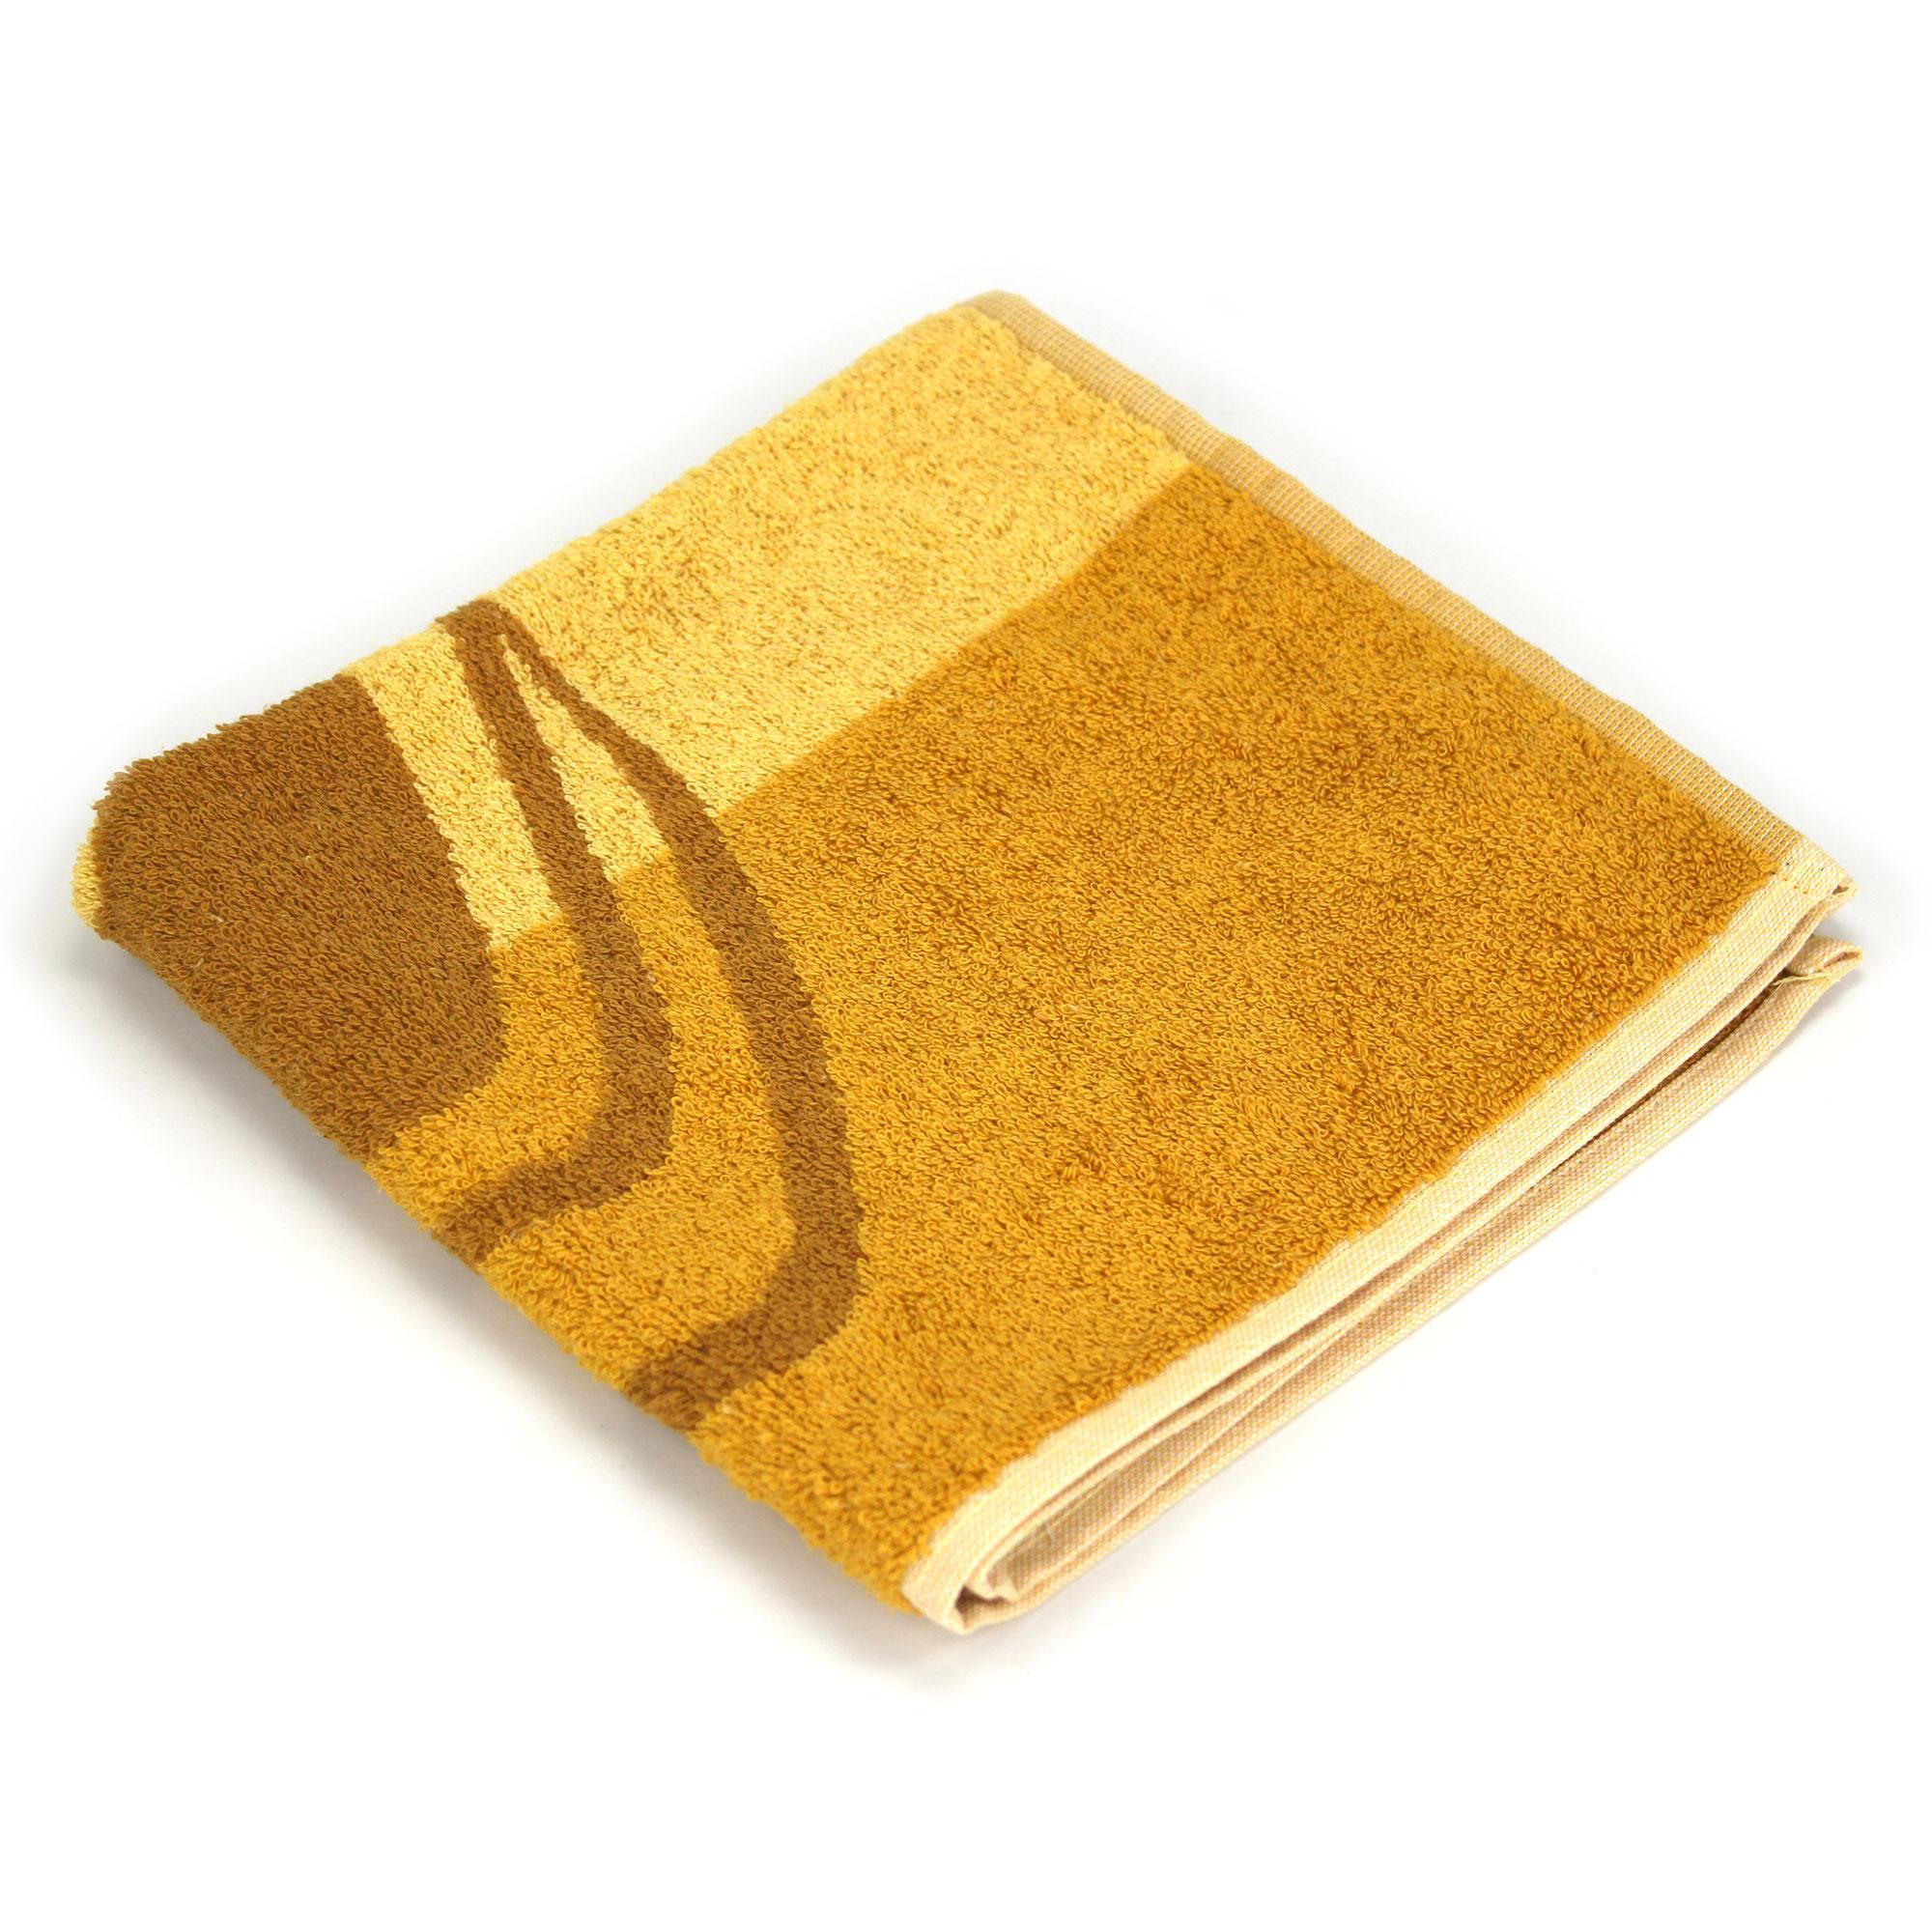 torchon de cuisine ponge 50x50 cakes jaune ebay. Black Bedroom Furniture Sets. Home Design Ideas